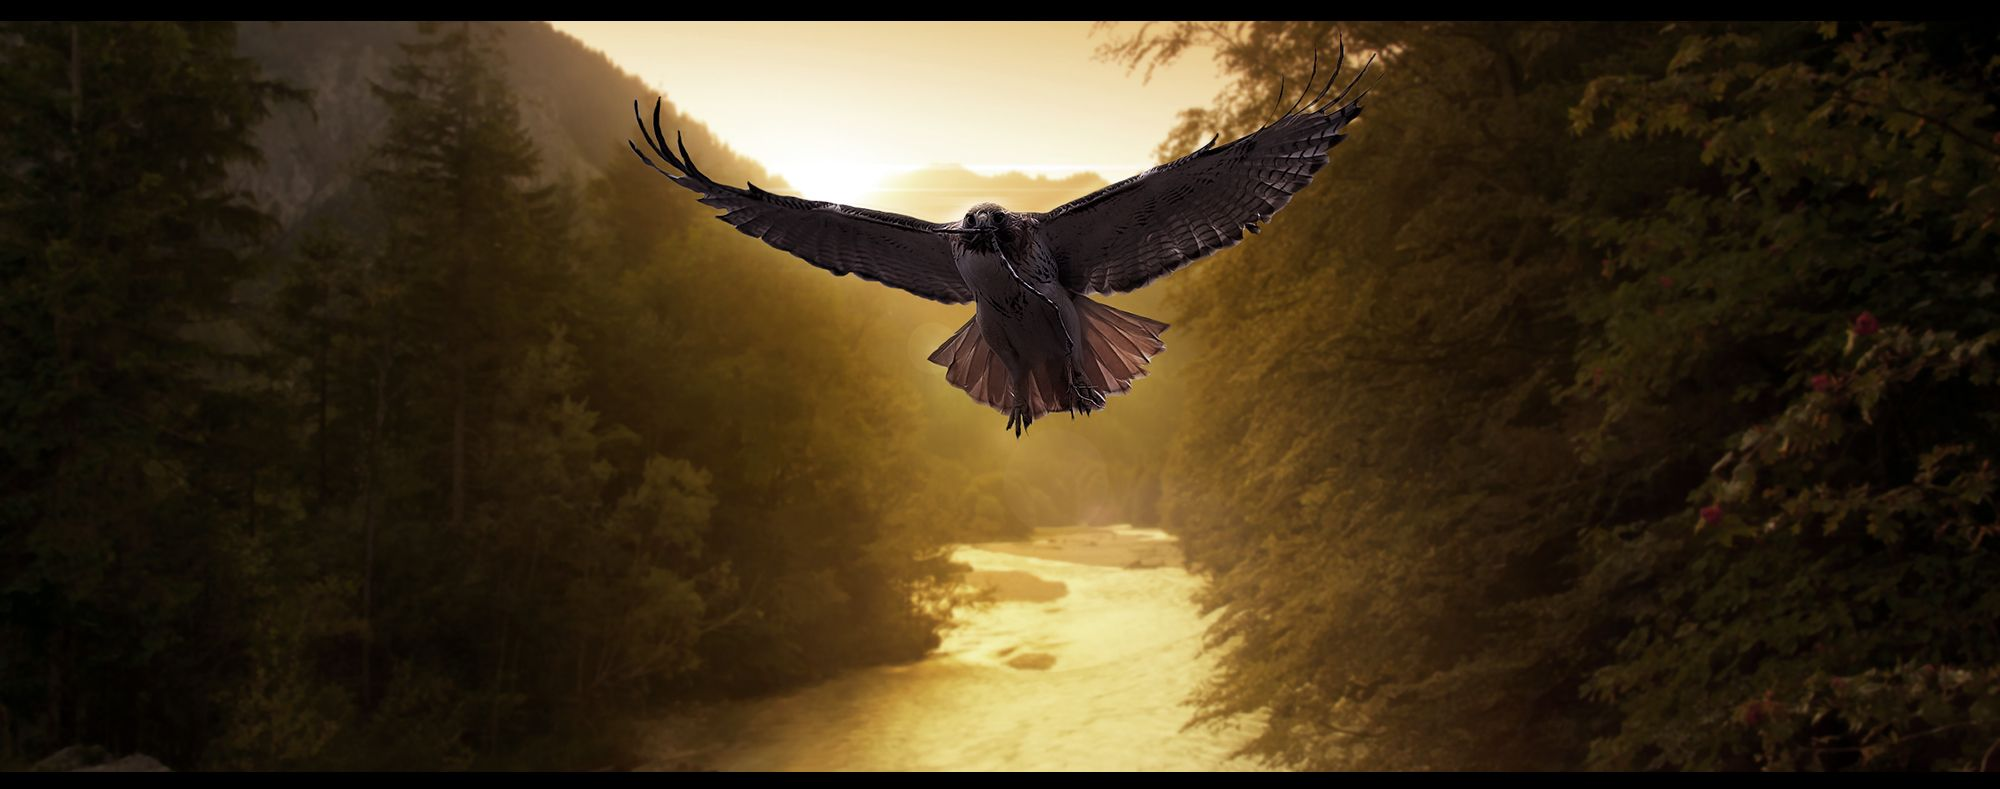 Bird of Prey by machiavellicro.deviantart.com